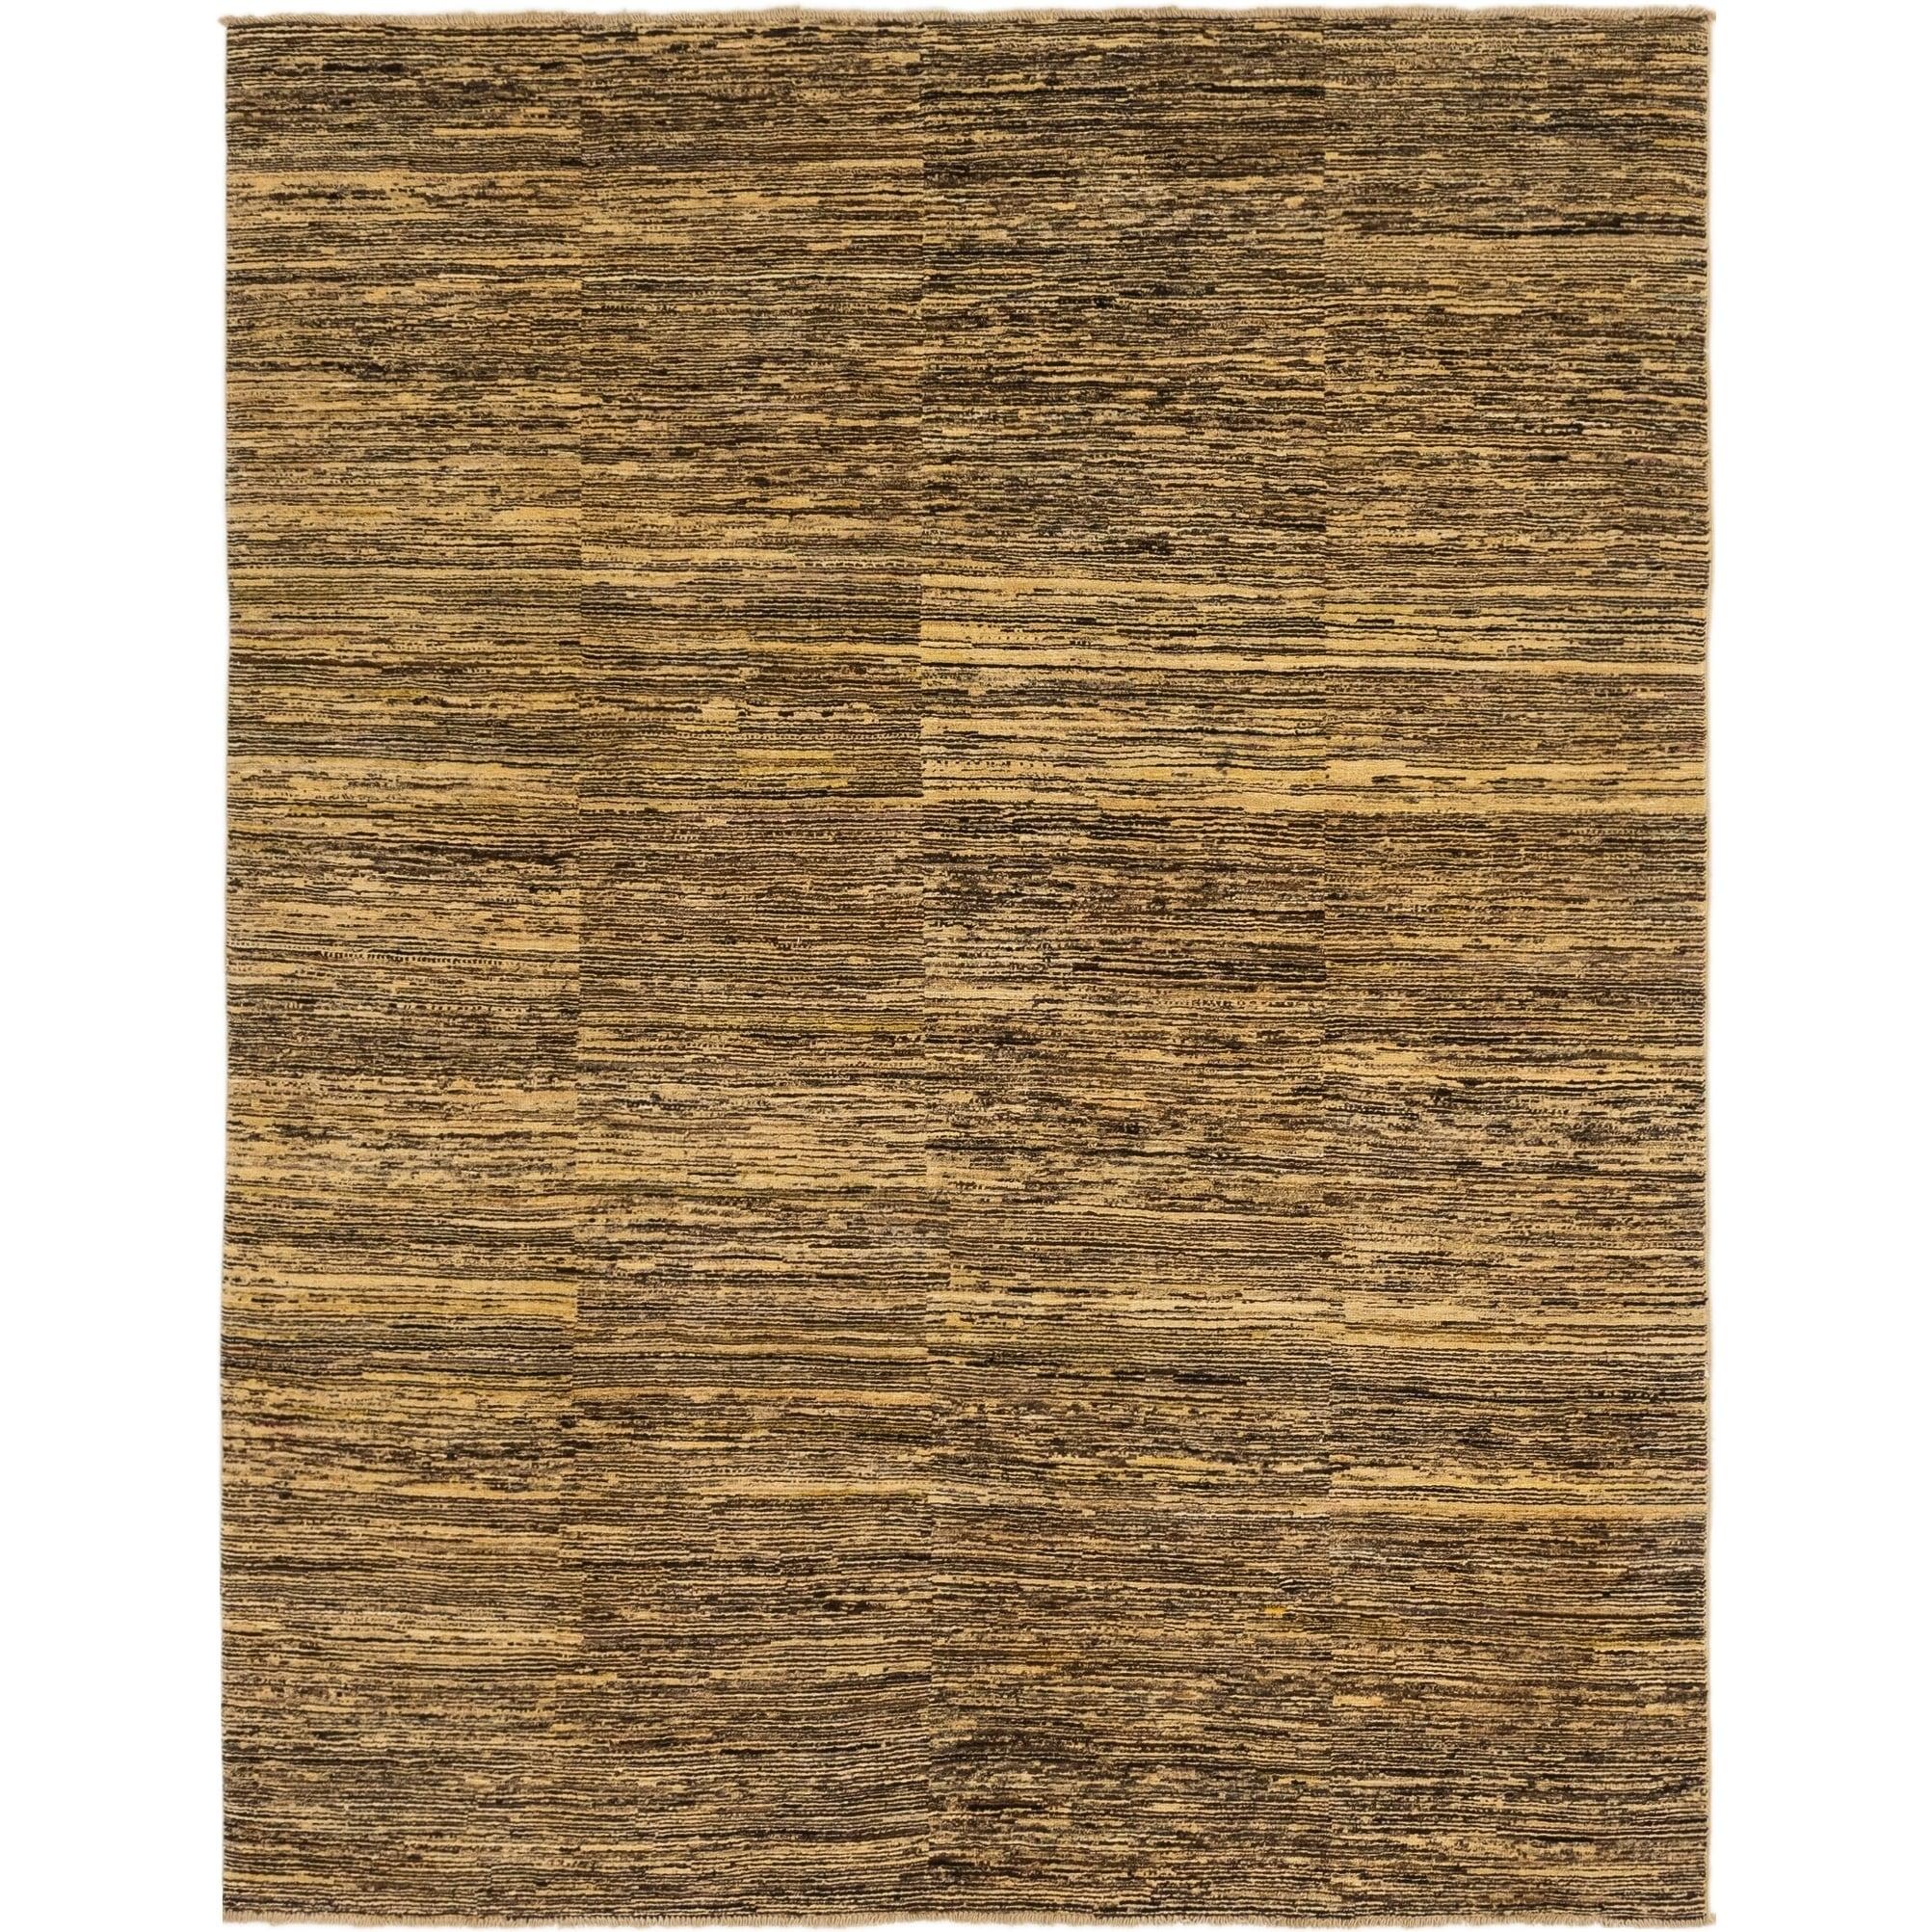 Hand Knotted Kashkuli Gabbeh Wool Area Rug - 6 2 x 7 9 (Multi - 6 2 x 7 9)